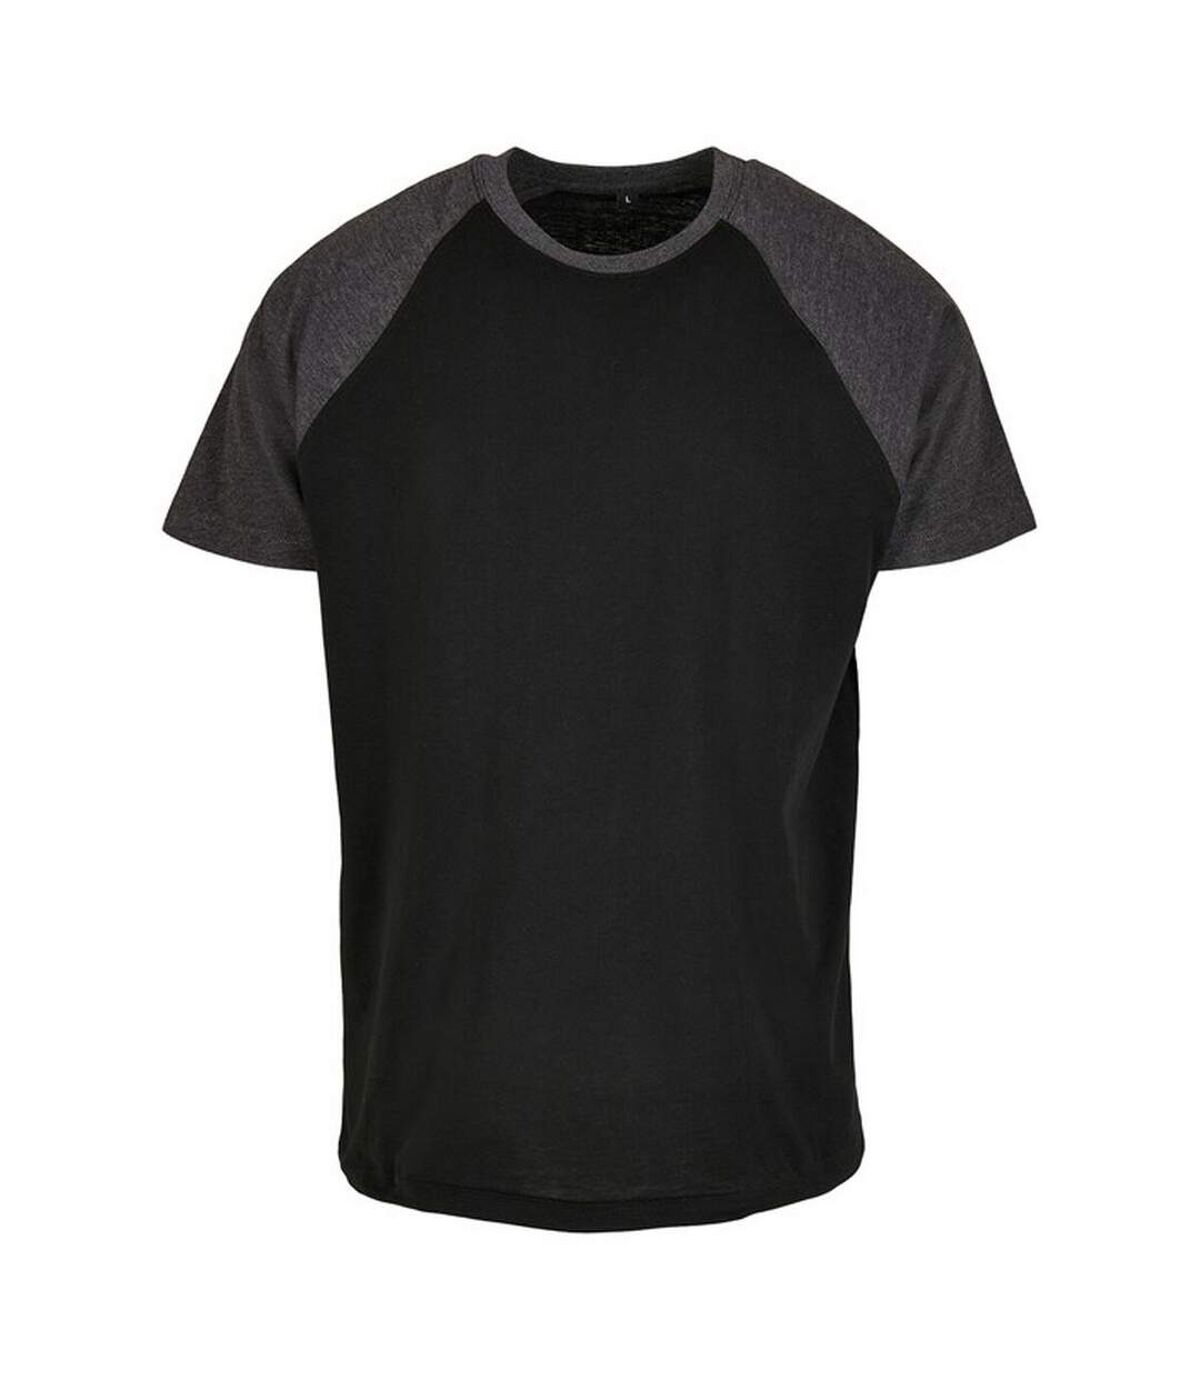 Build Your Brand Mens Raglan Contrast Tee (Black/Charcoal) - UTRW5817